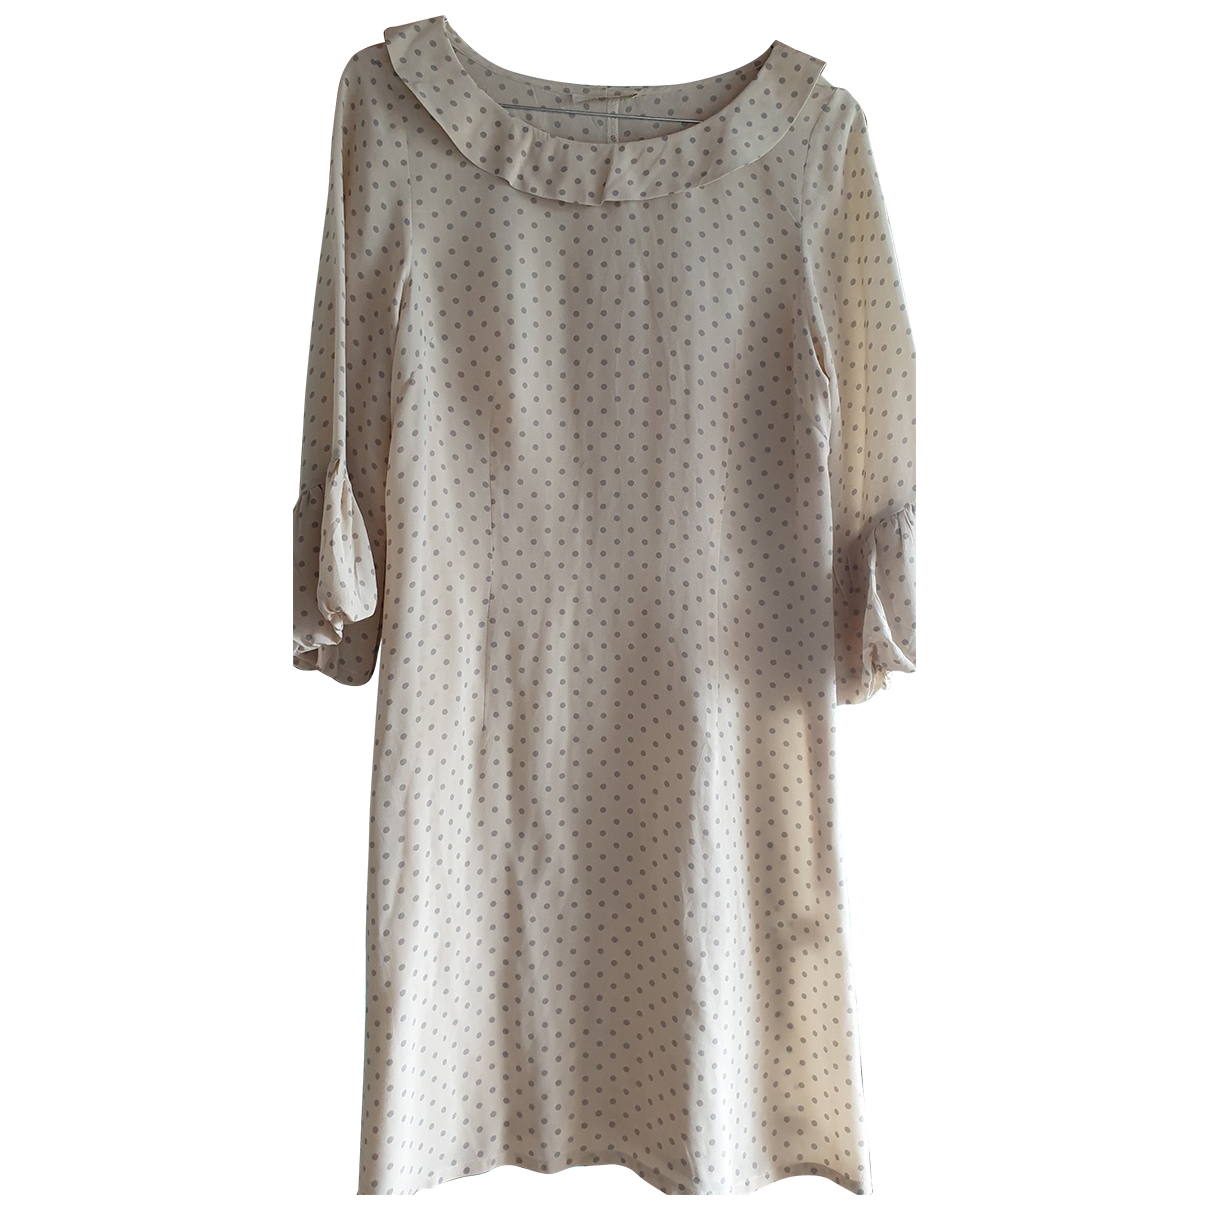 Bel Air \N Beige Silk dress for Women 1 0-5